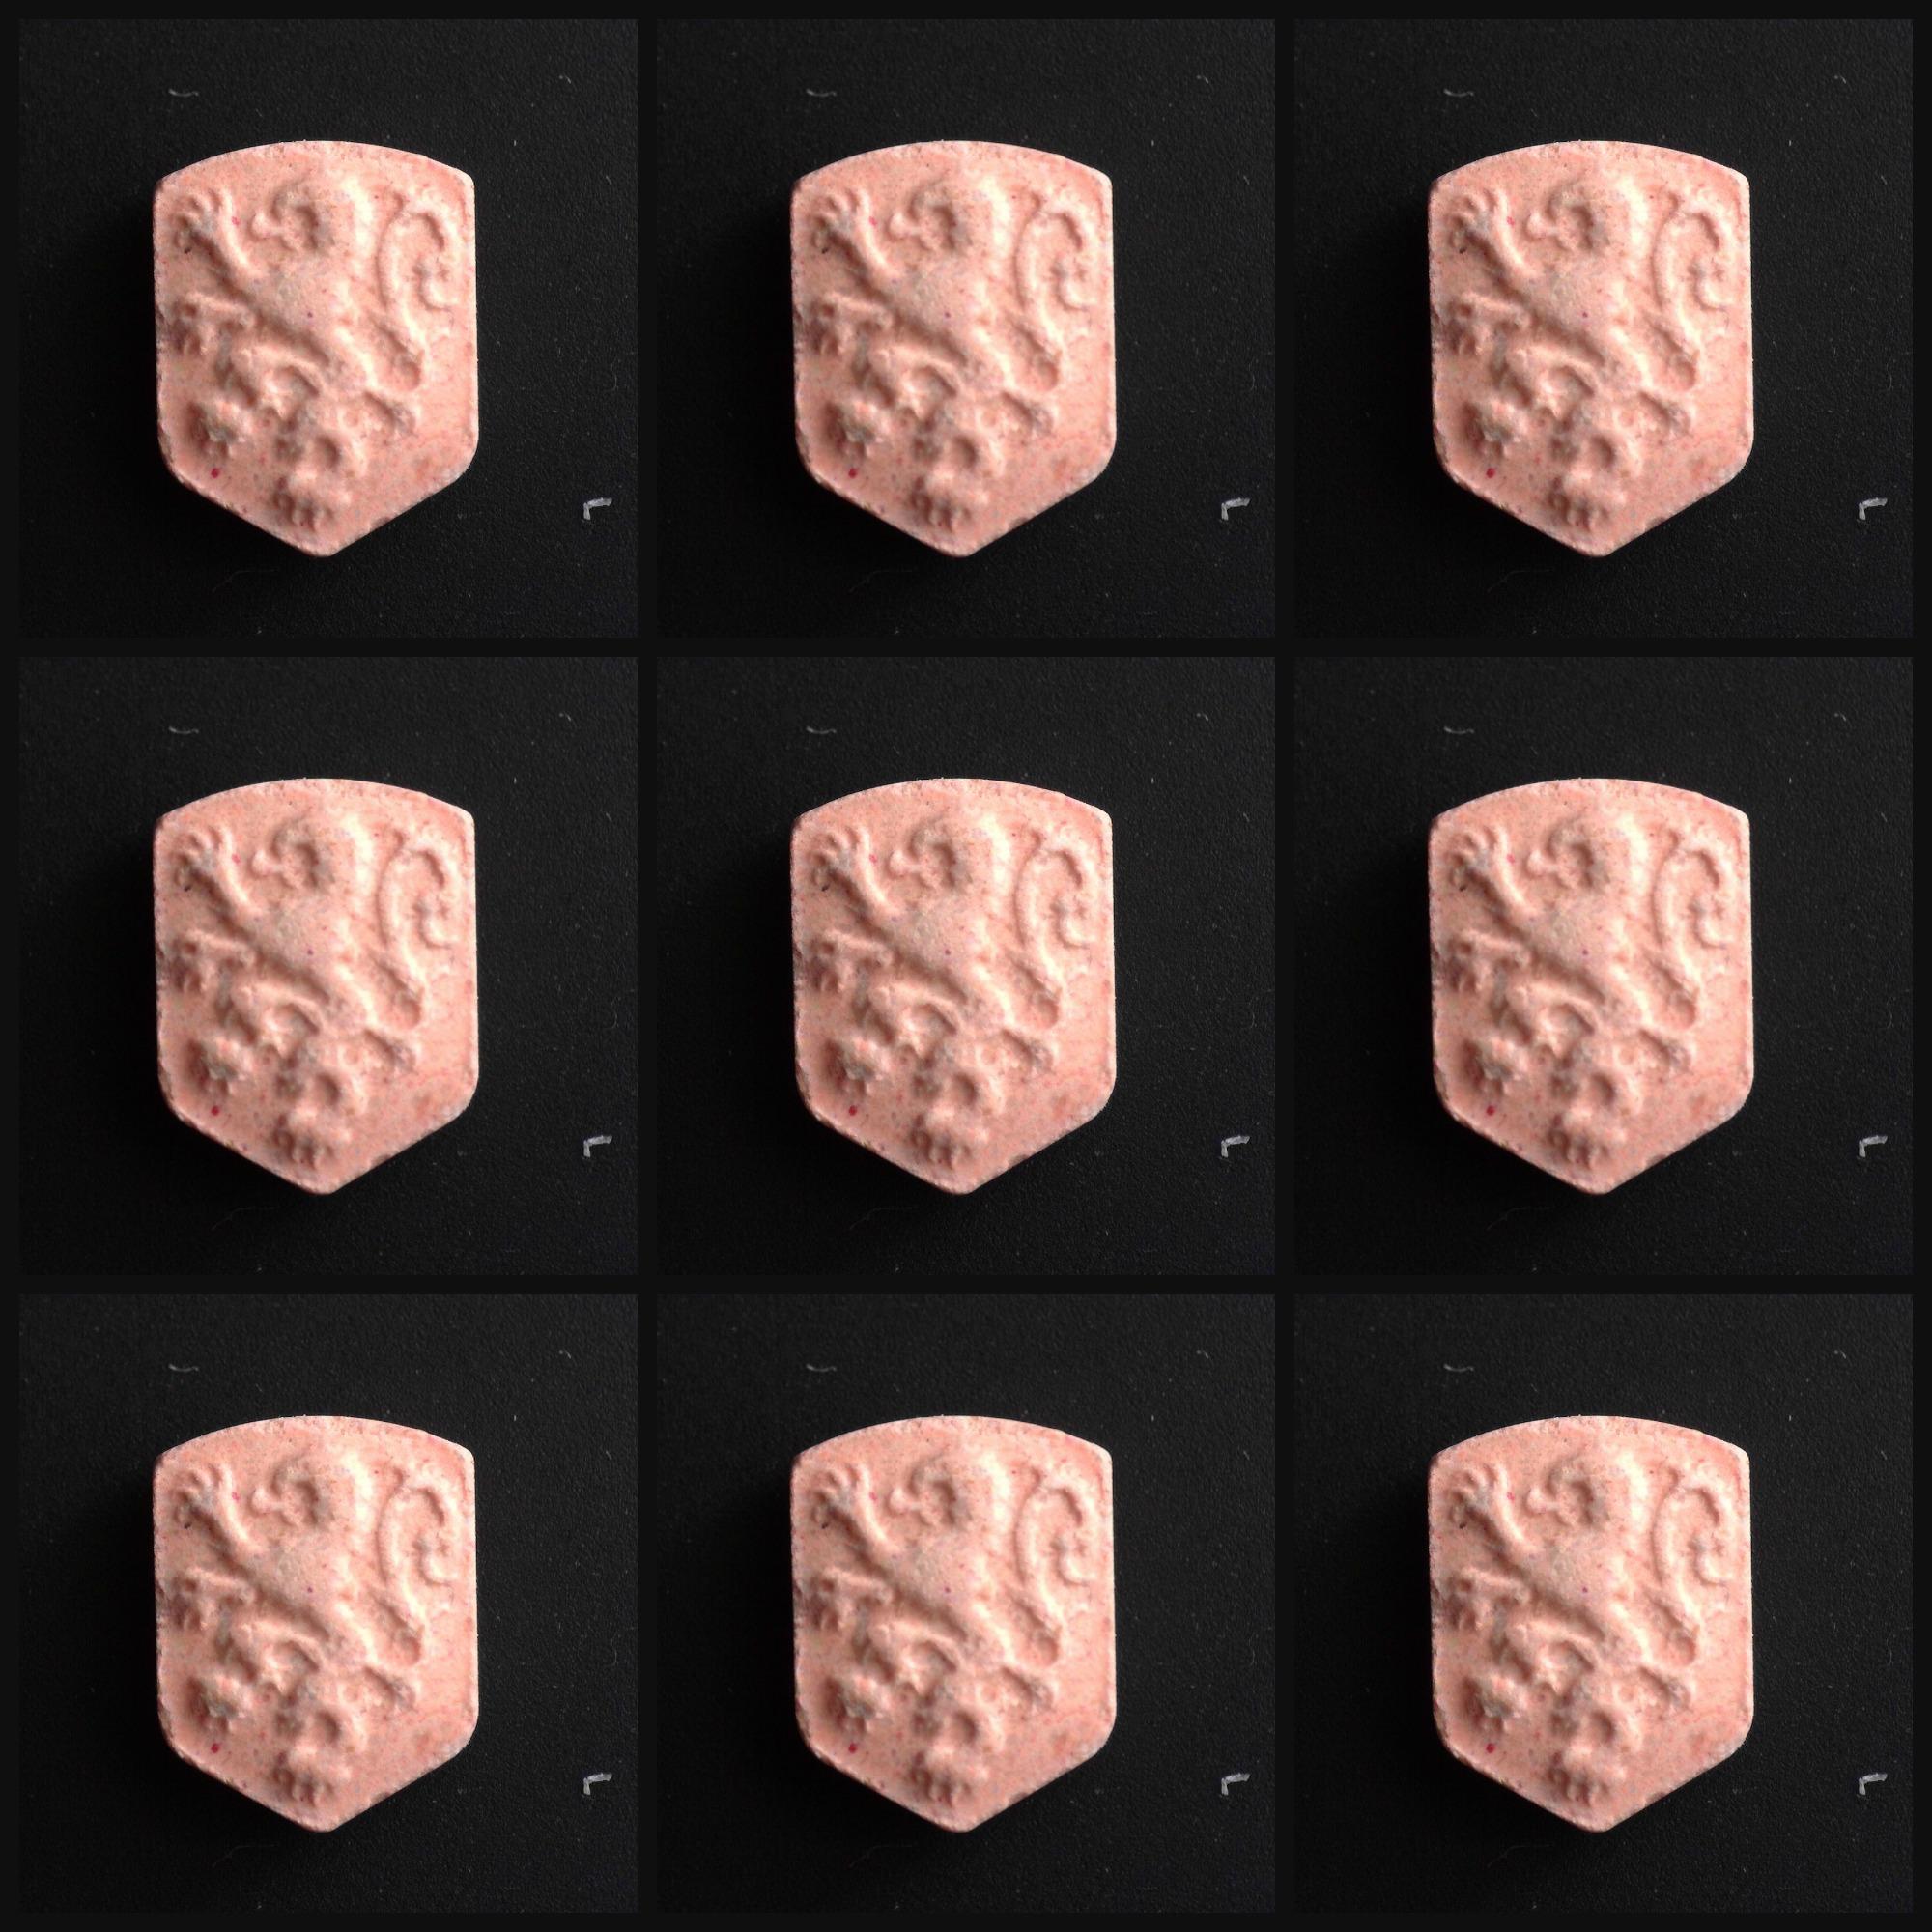 MDMA Collage